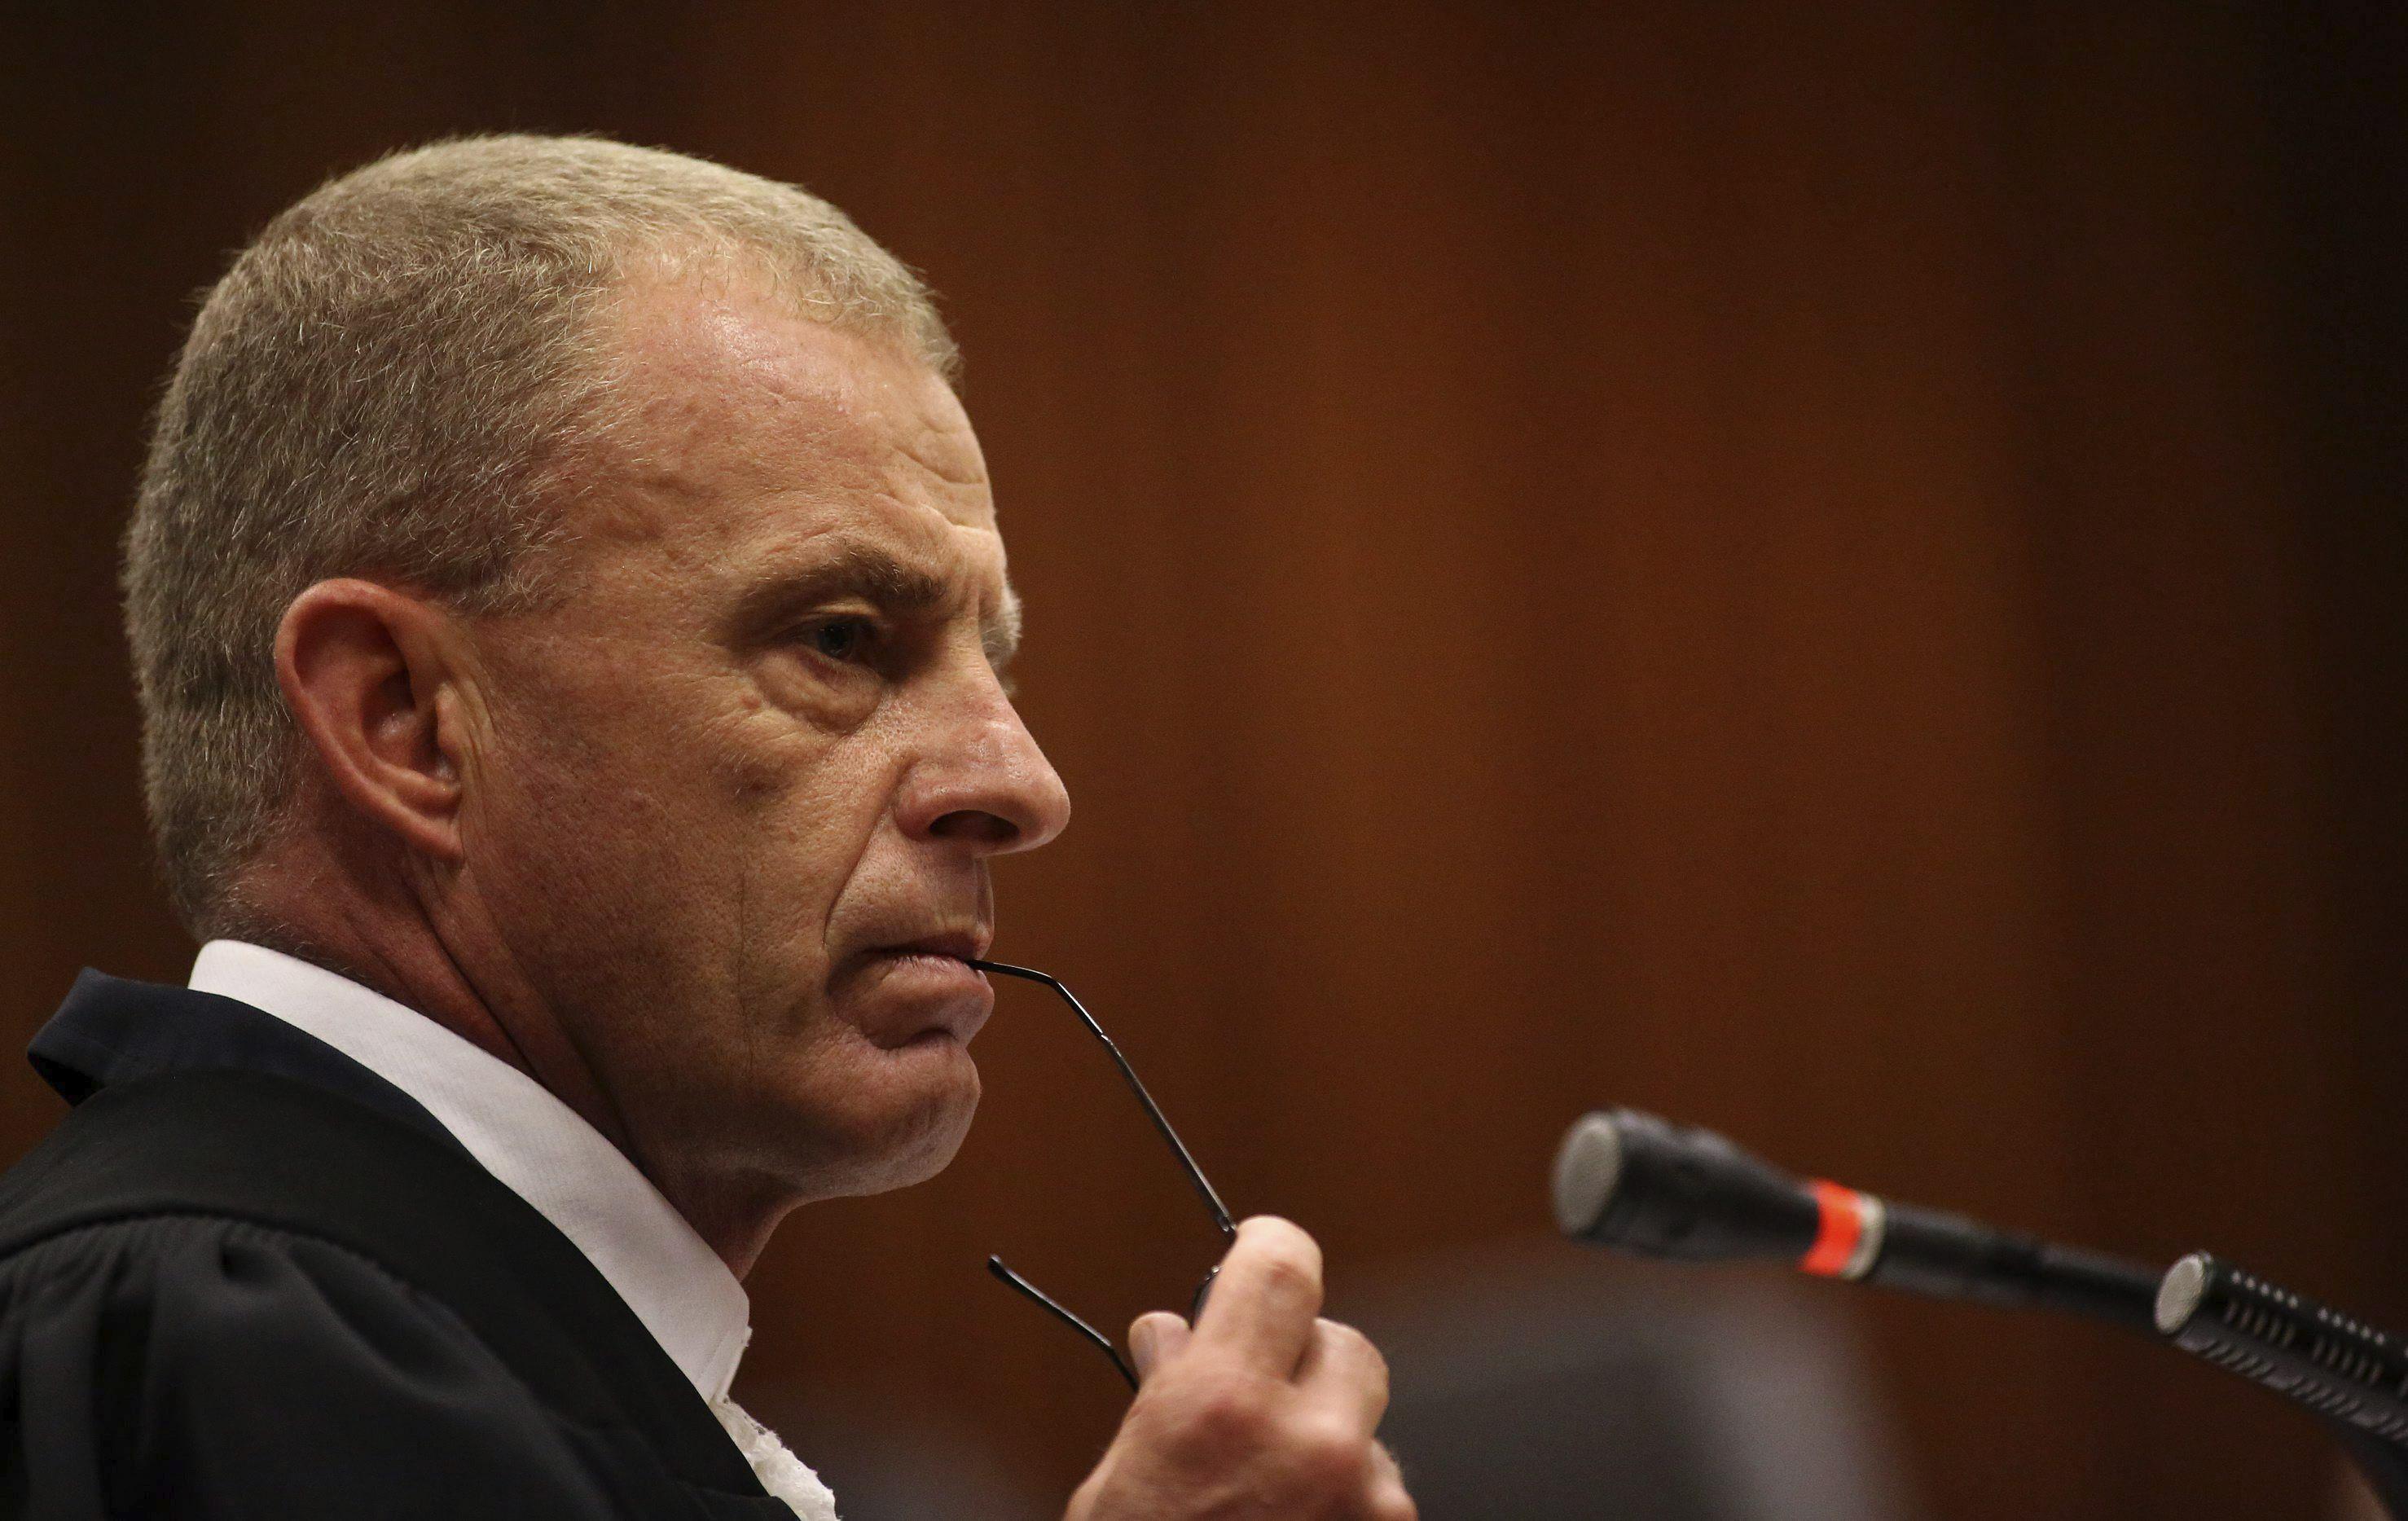 Pistorius reitera su inocencia durante el duro interrogatorio del fiscal